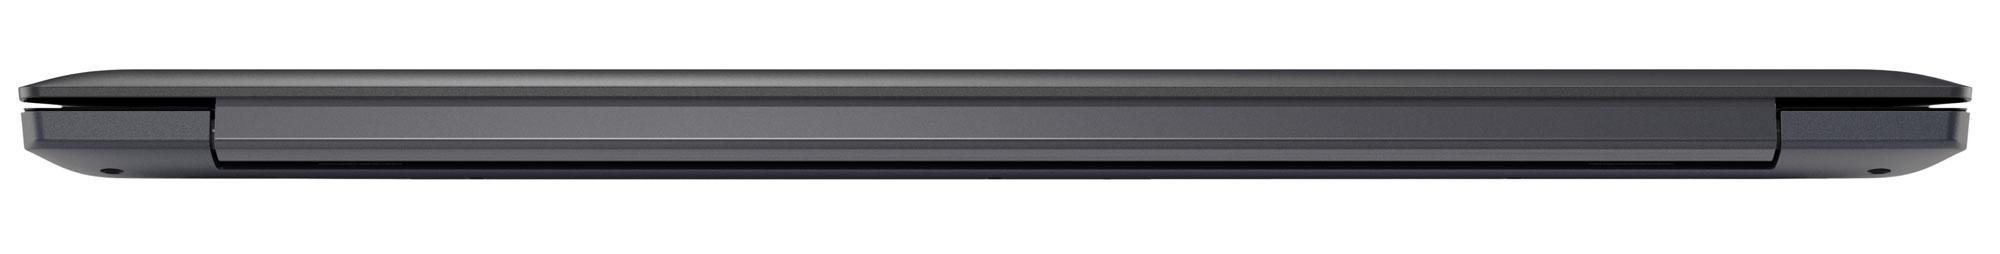 Фото  Ноутбук Lenovo V320-17IKB Iron Grey (81AH005XRA)